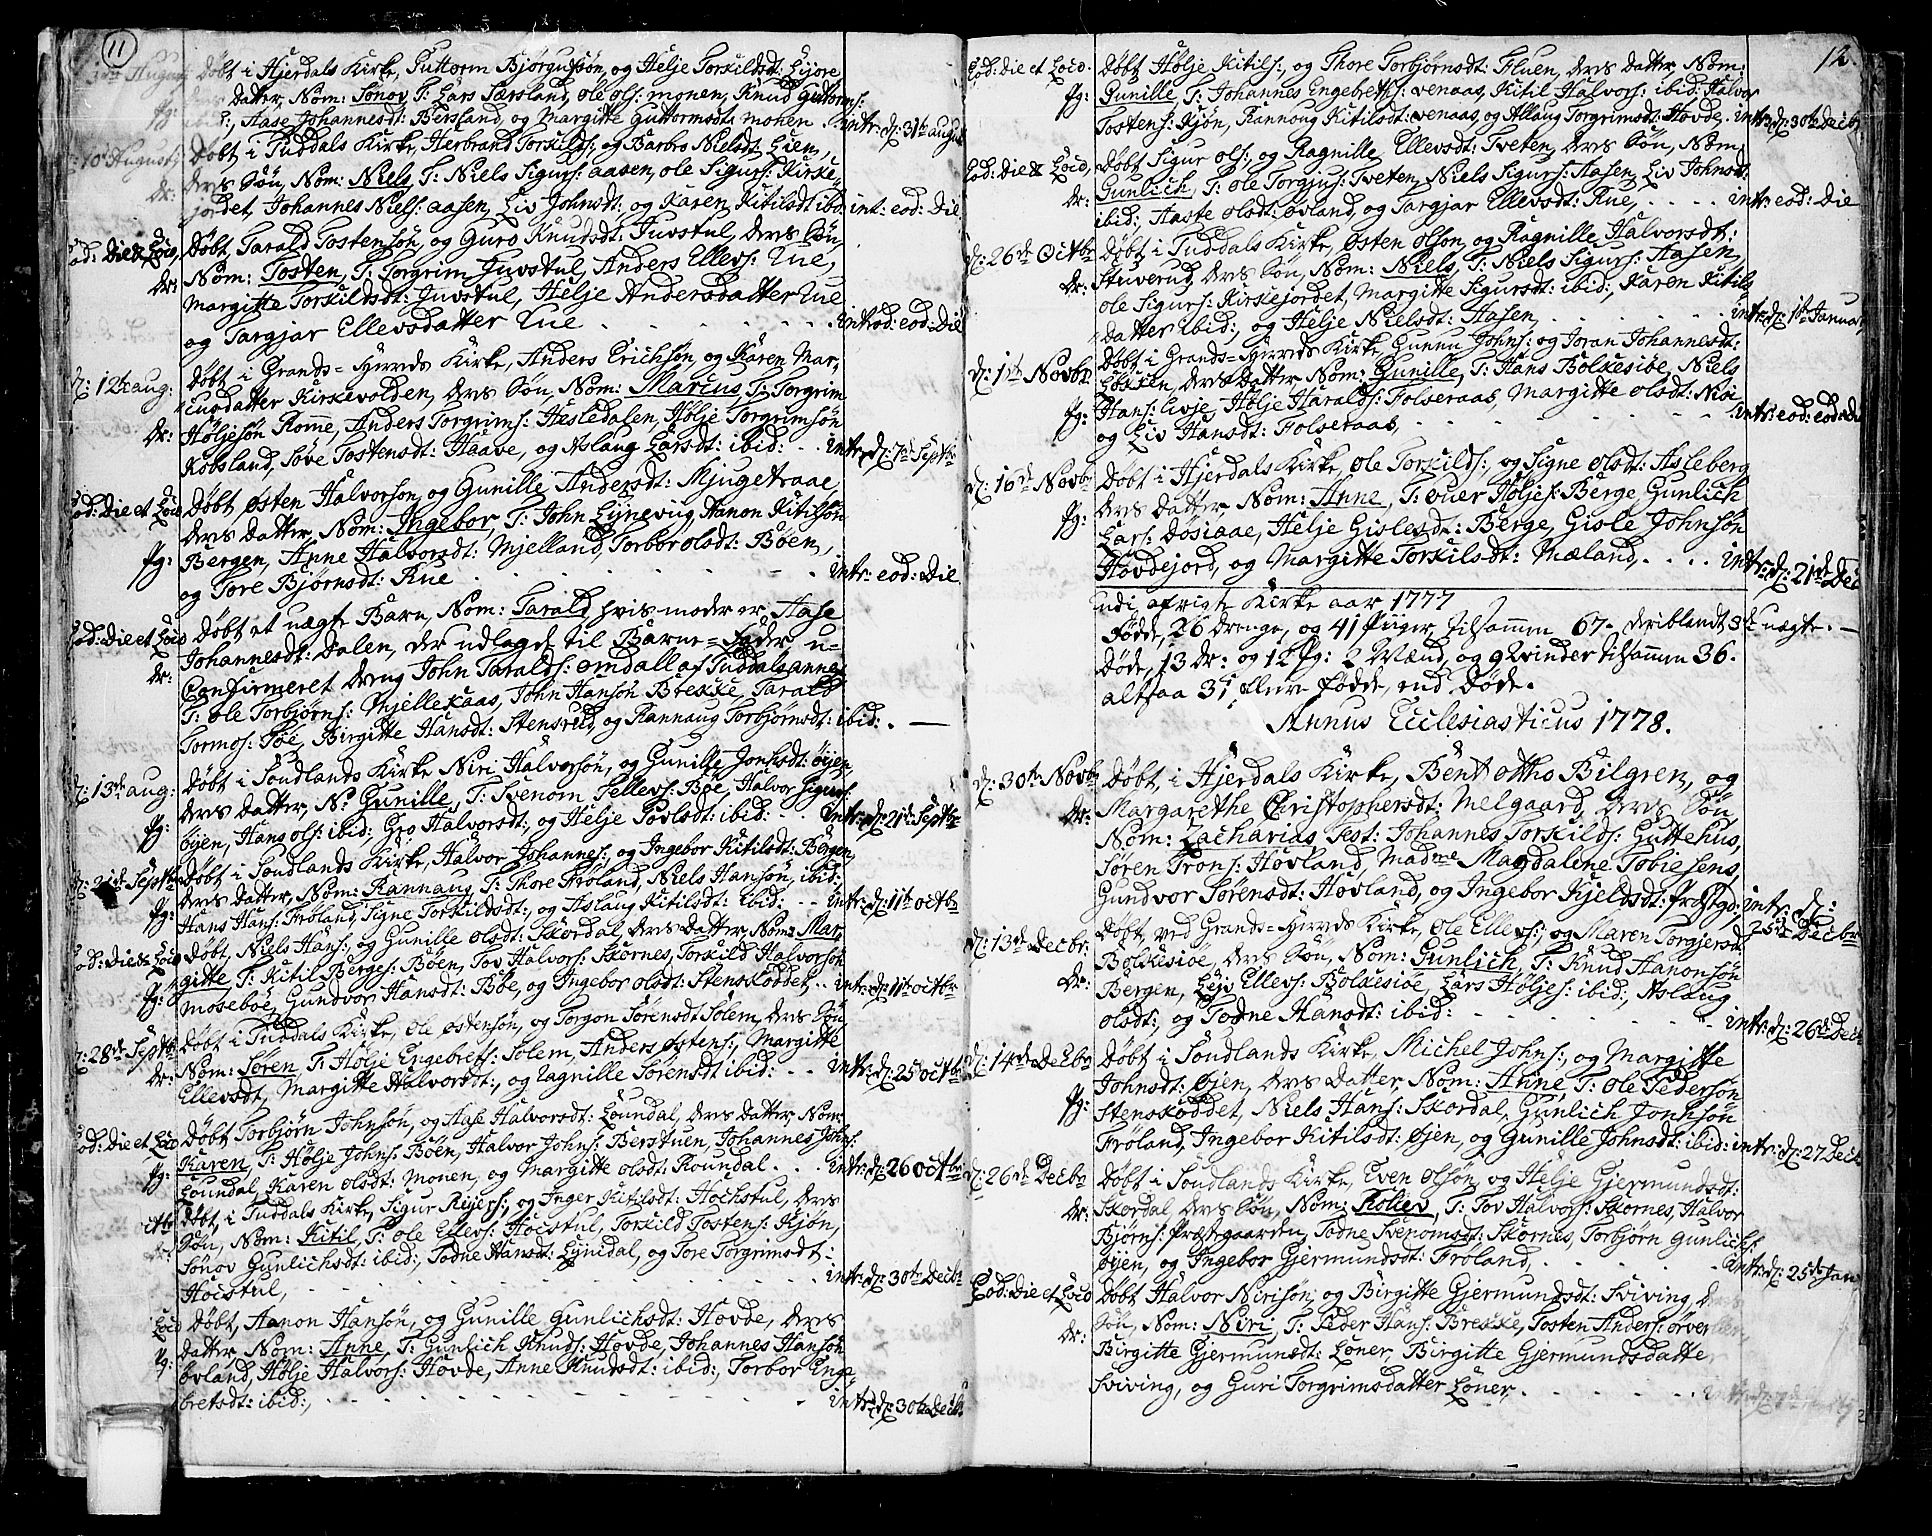 SAKO, Hjartdal kirkebøker, F/Fa/L0005: Ministerialbok nr. I 5, 1776-1801, s. 11-12